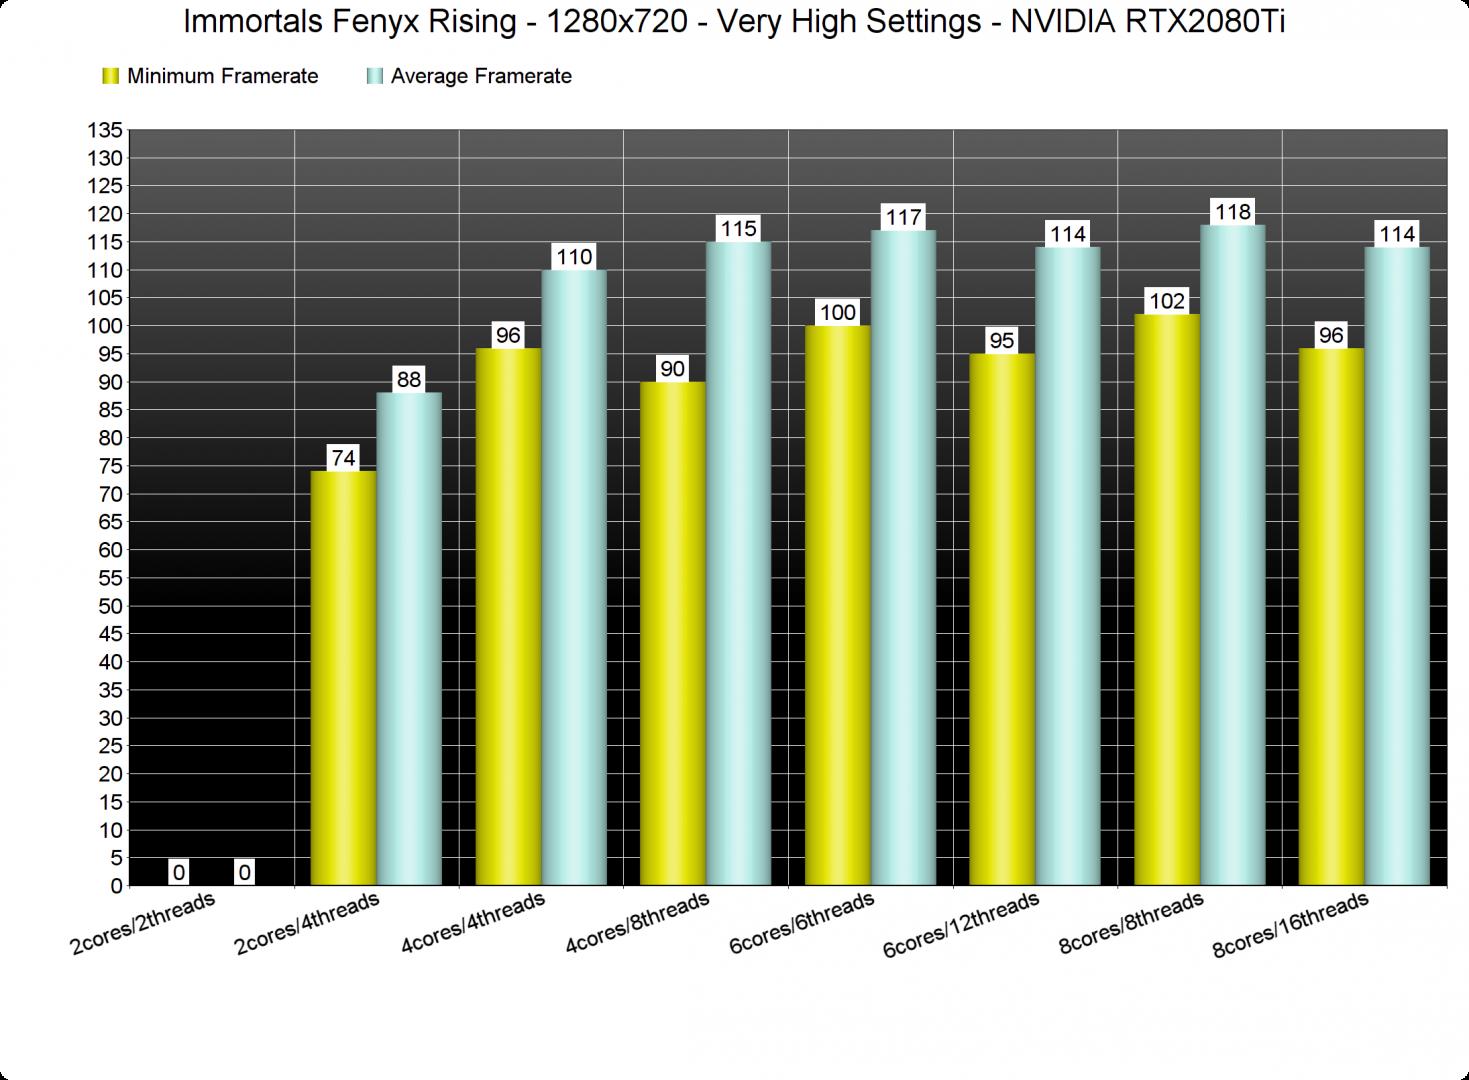 Immortals Fenyx Rising CPU benchmarks-1